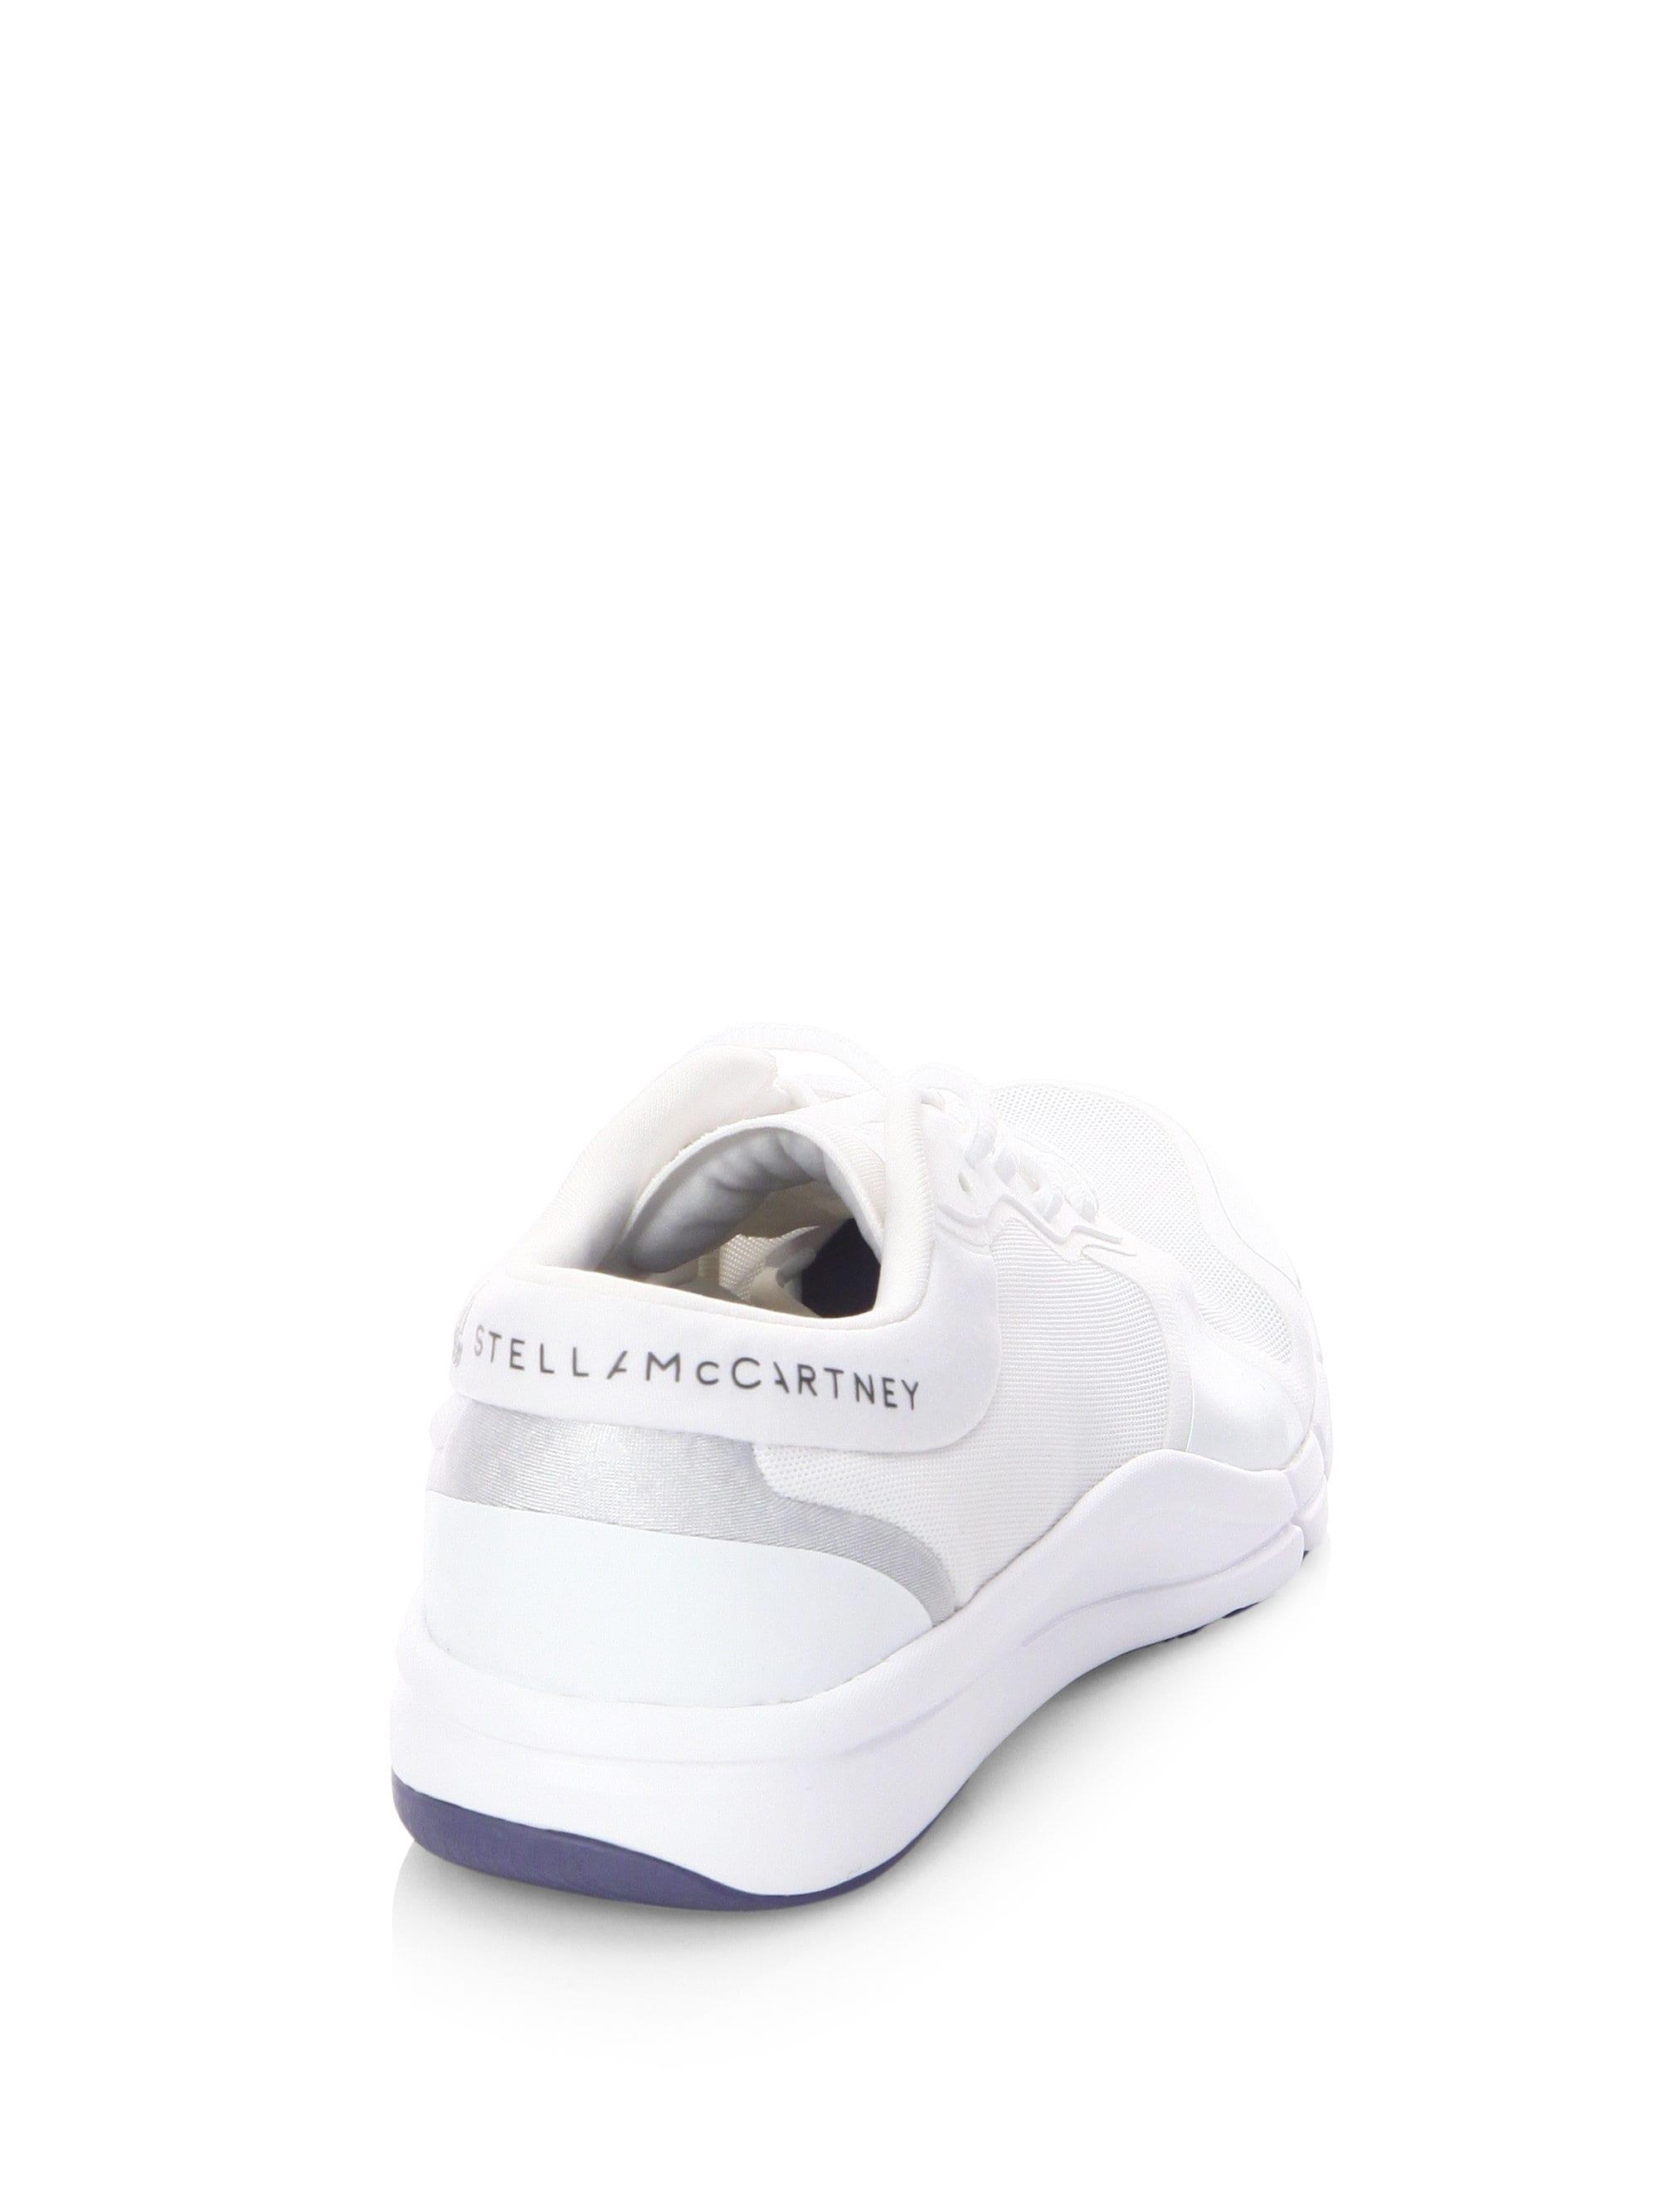 f73c90ecc46f Adidas By Stella McCartney - White Adipure Trainer Sneakers - Lyst. View  fullscreen